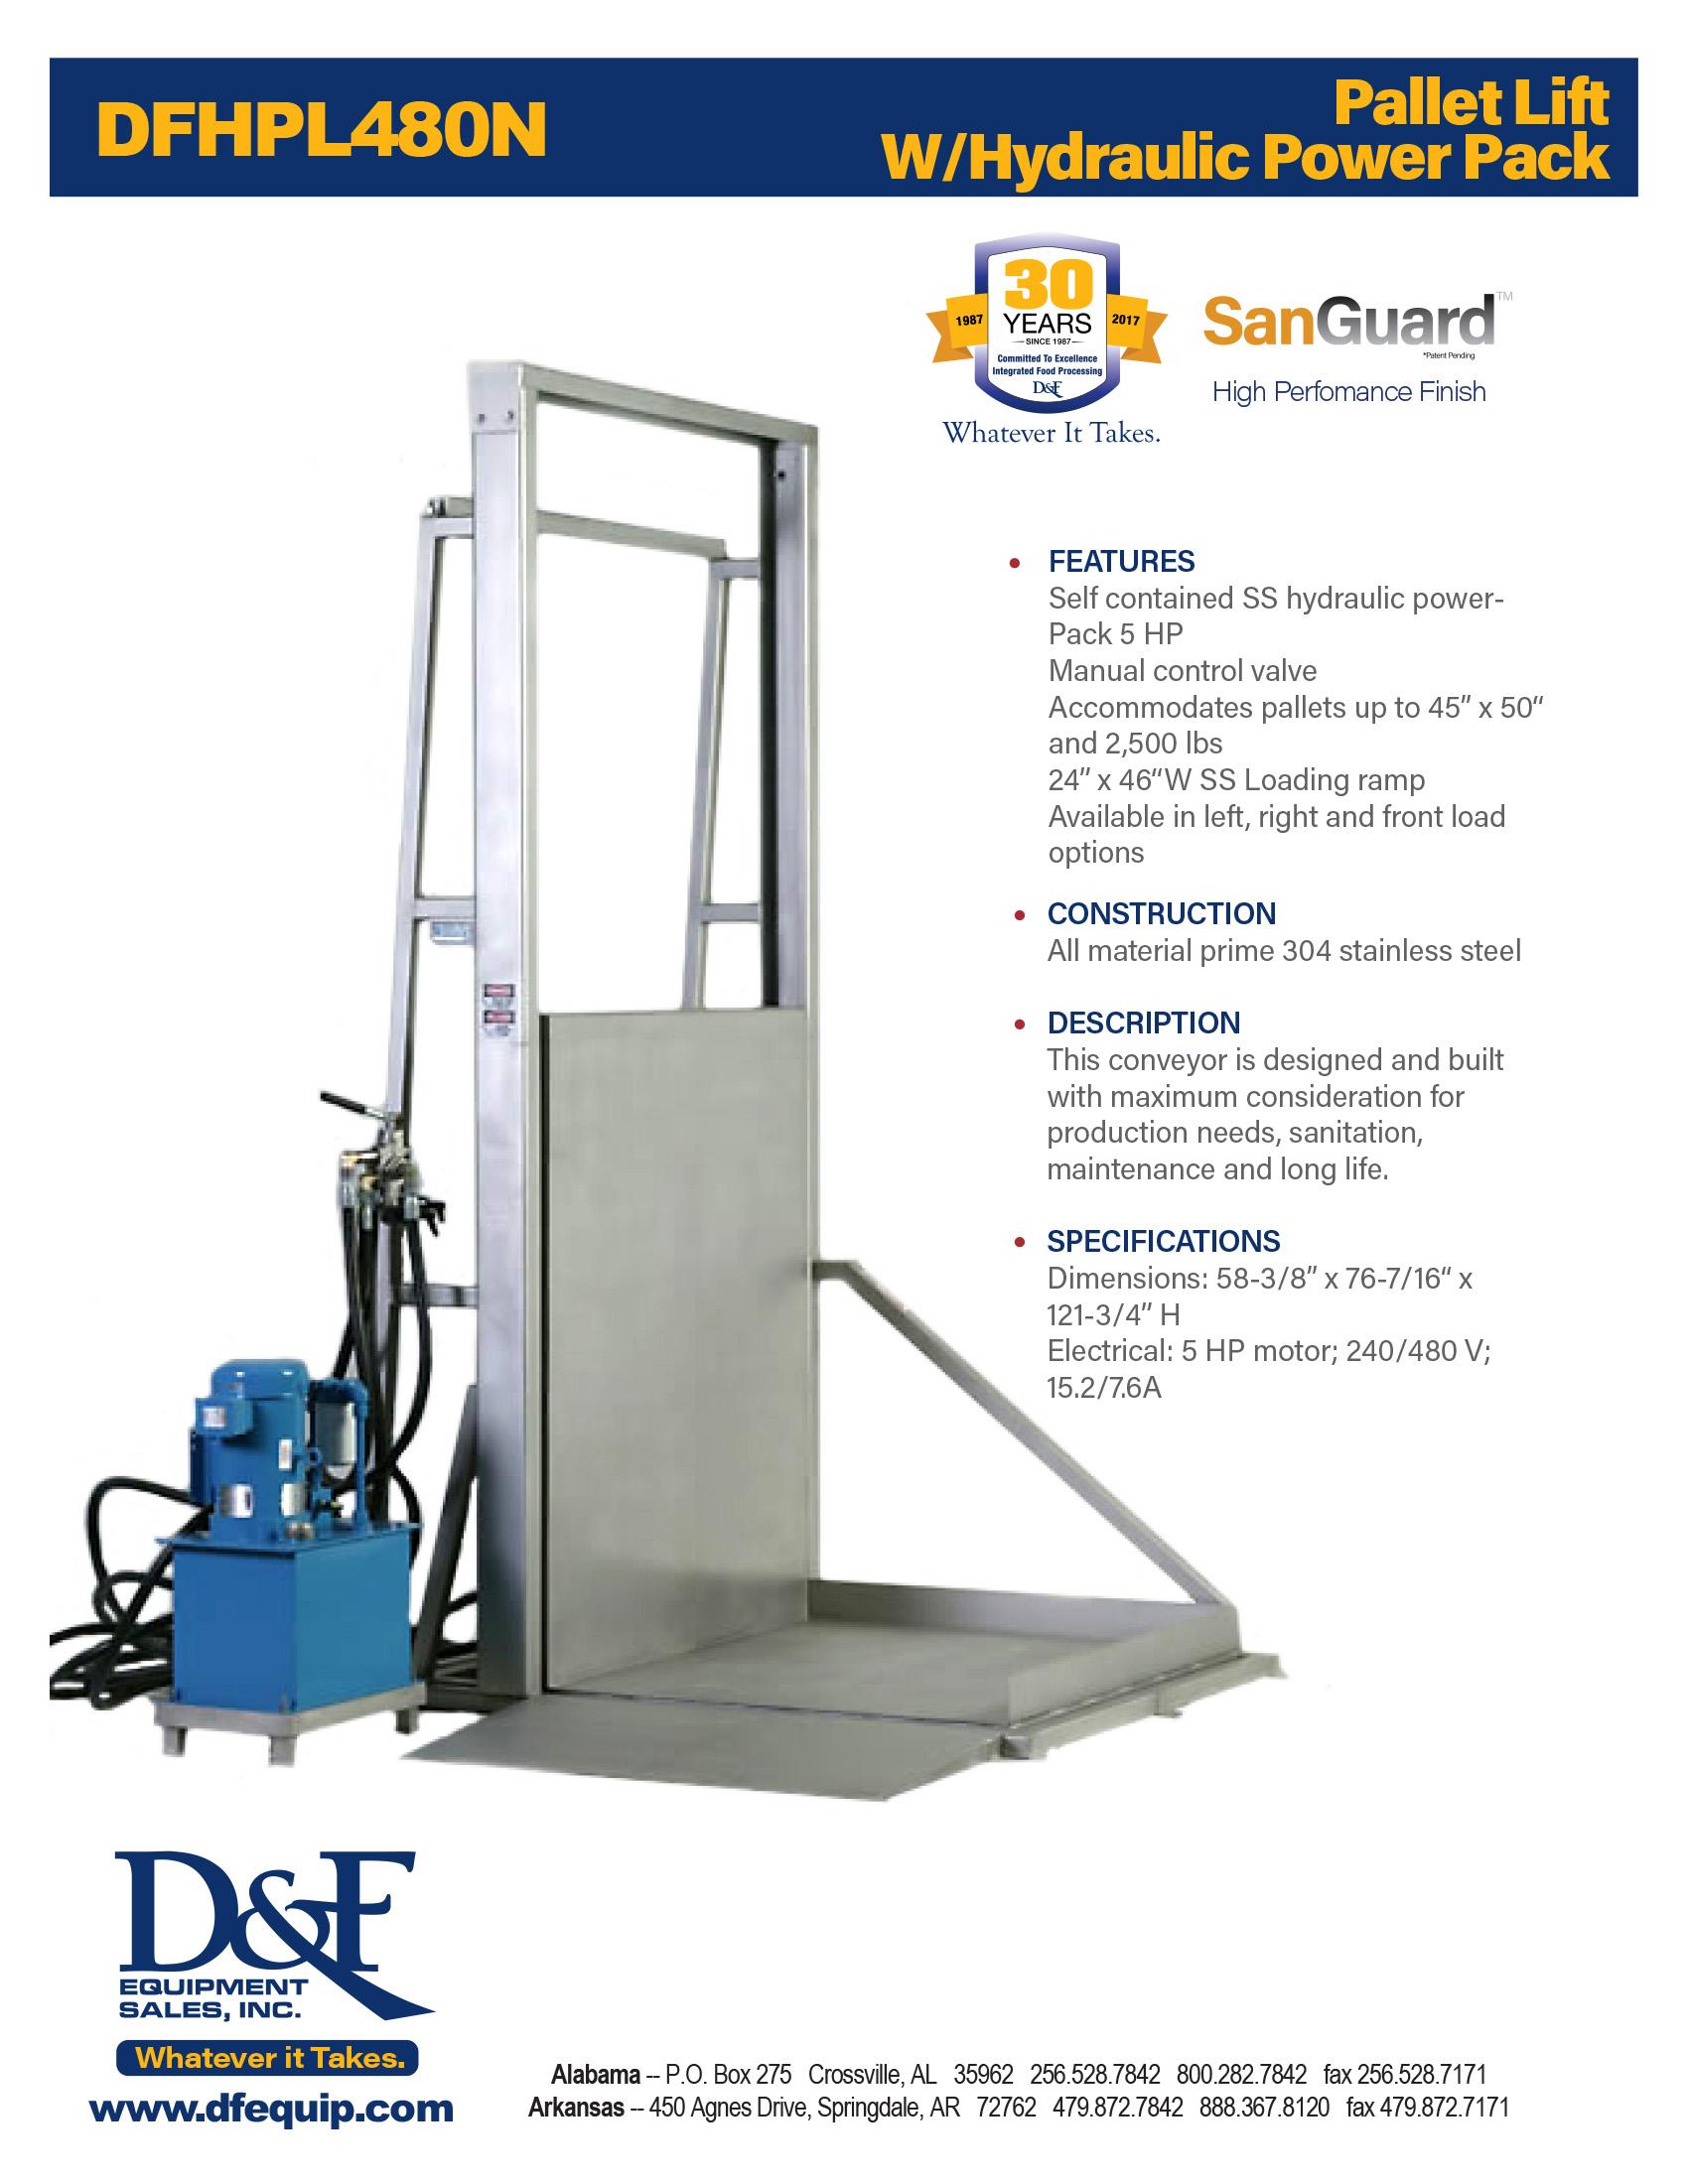 DFHPL480N-PalletLift-w-hydraulicPowerPack2017.jpg